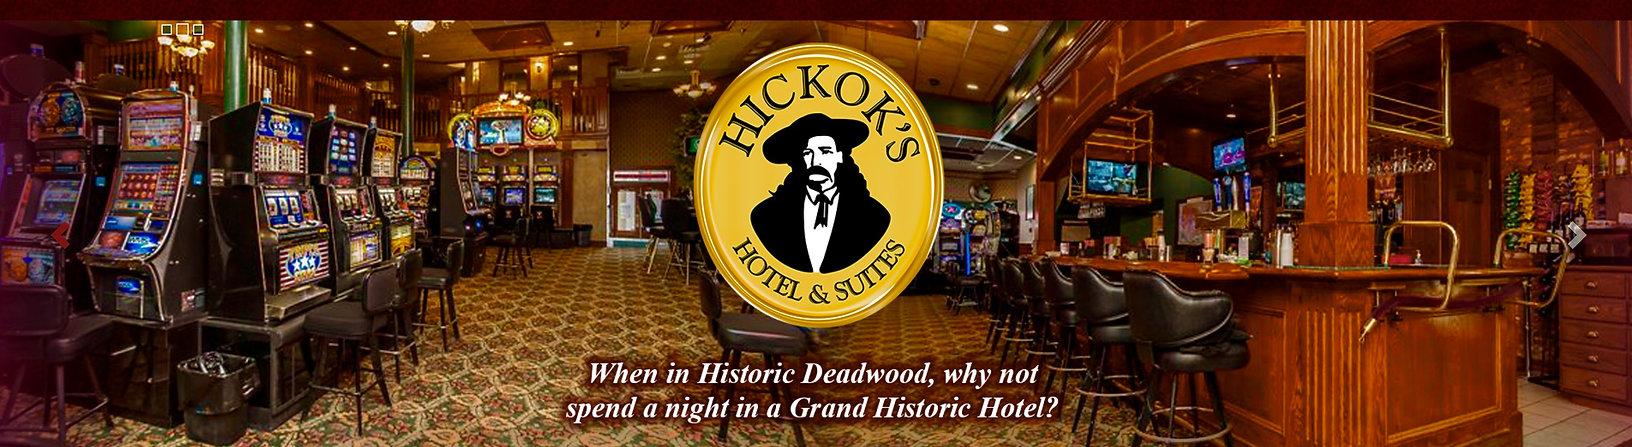 Hickok's Hotel & Casino